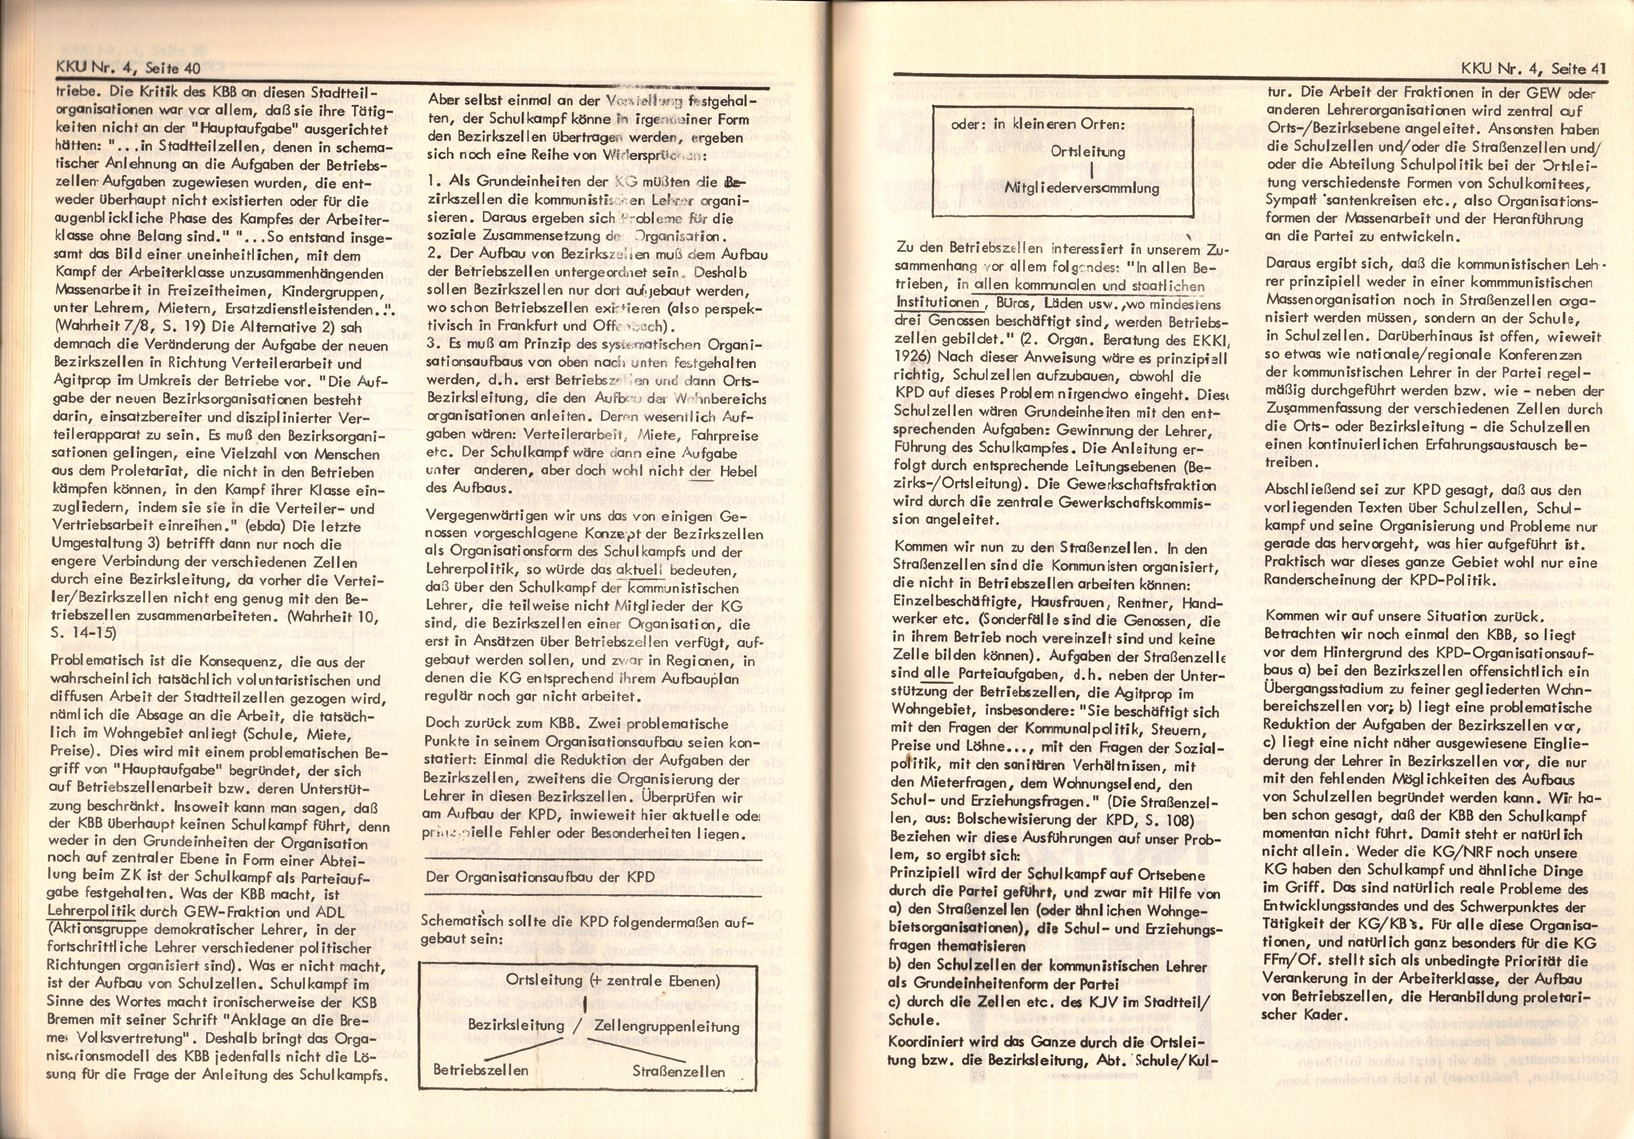 Frankfurt_Offenbach_KG_Kampf_Kritik_Umgestaltung_1973_04_05_21